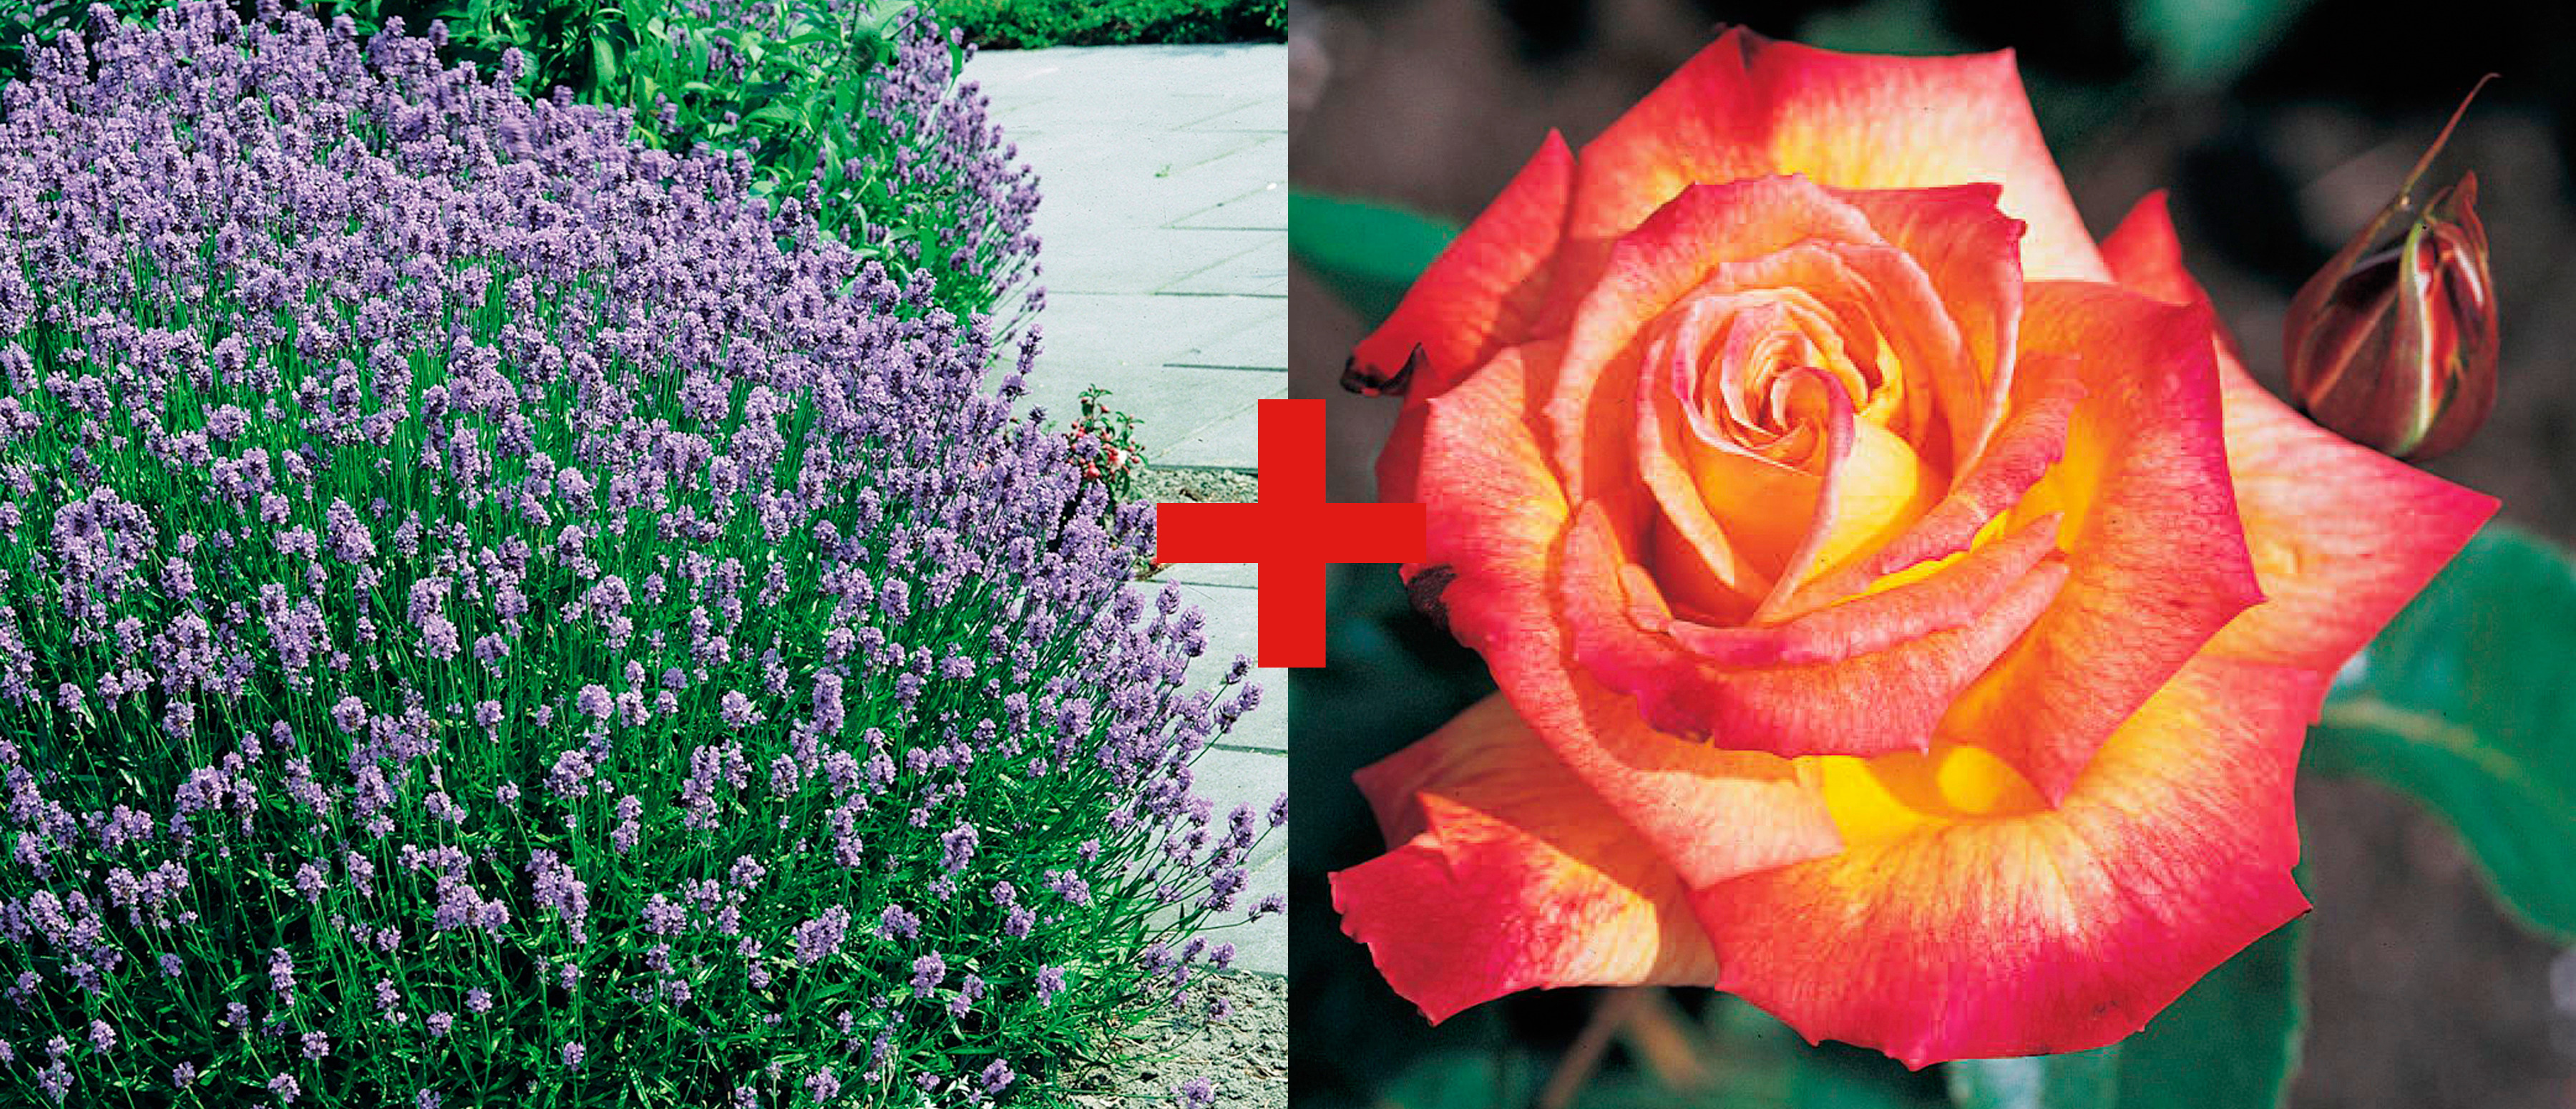 BCM Beetpflanze Rose Rumba & Lavendel bunt Beetpflanzen Pflanzen Garten Balkon